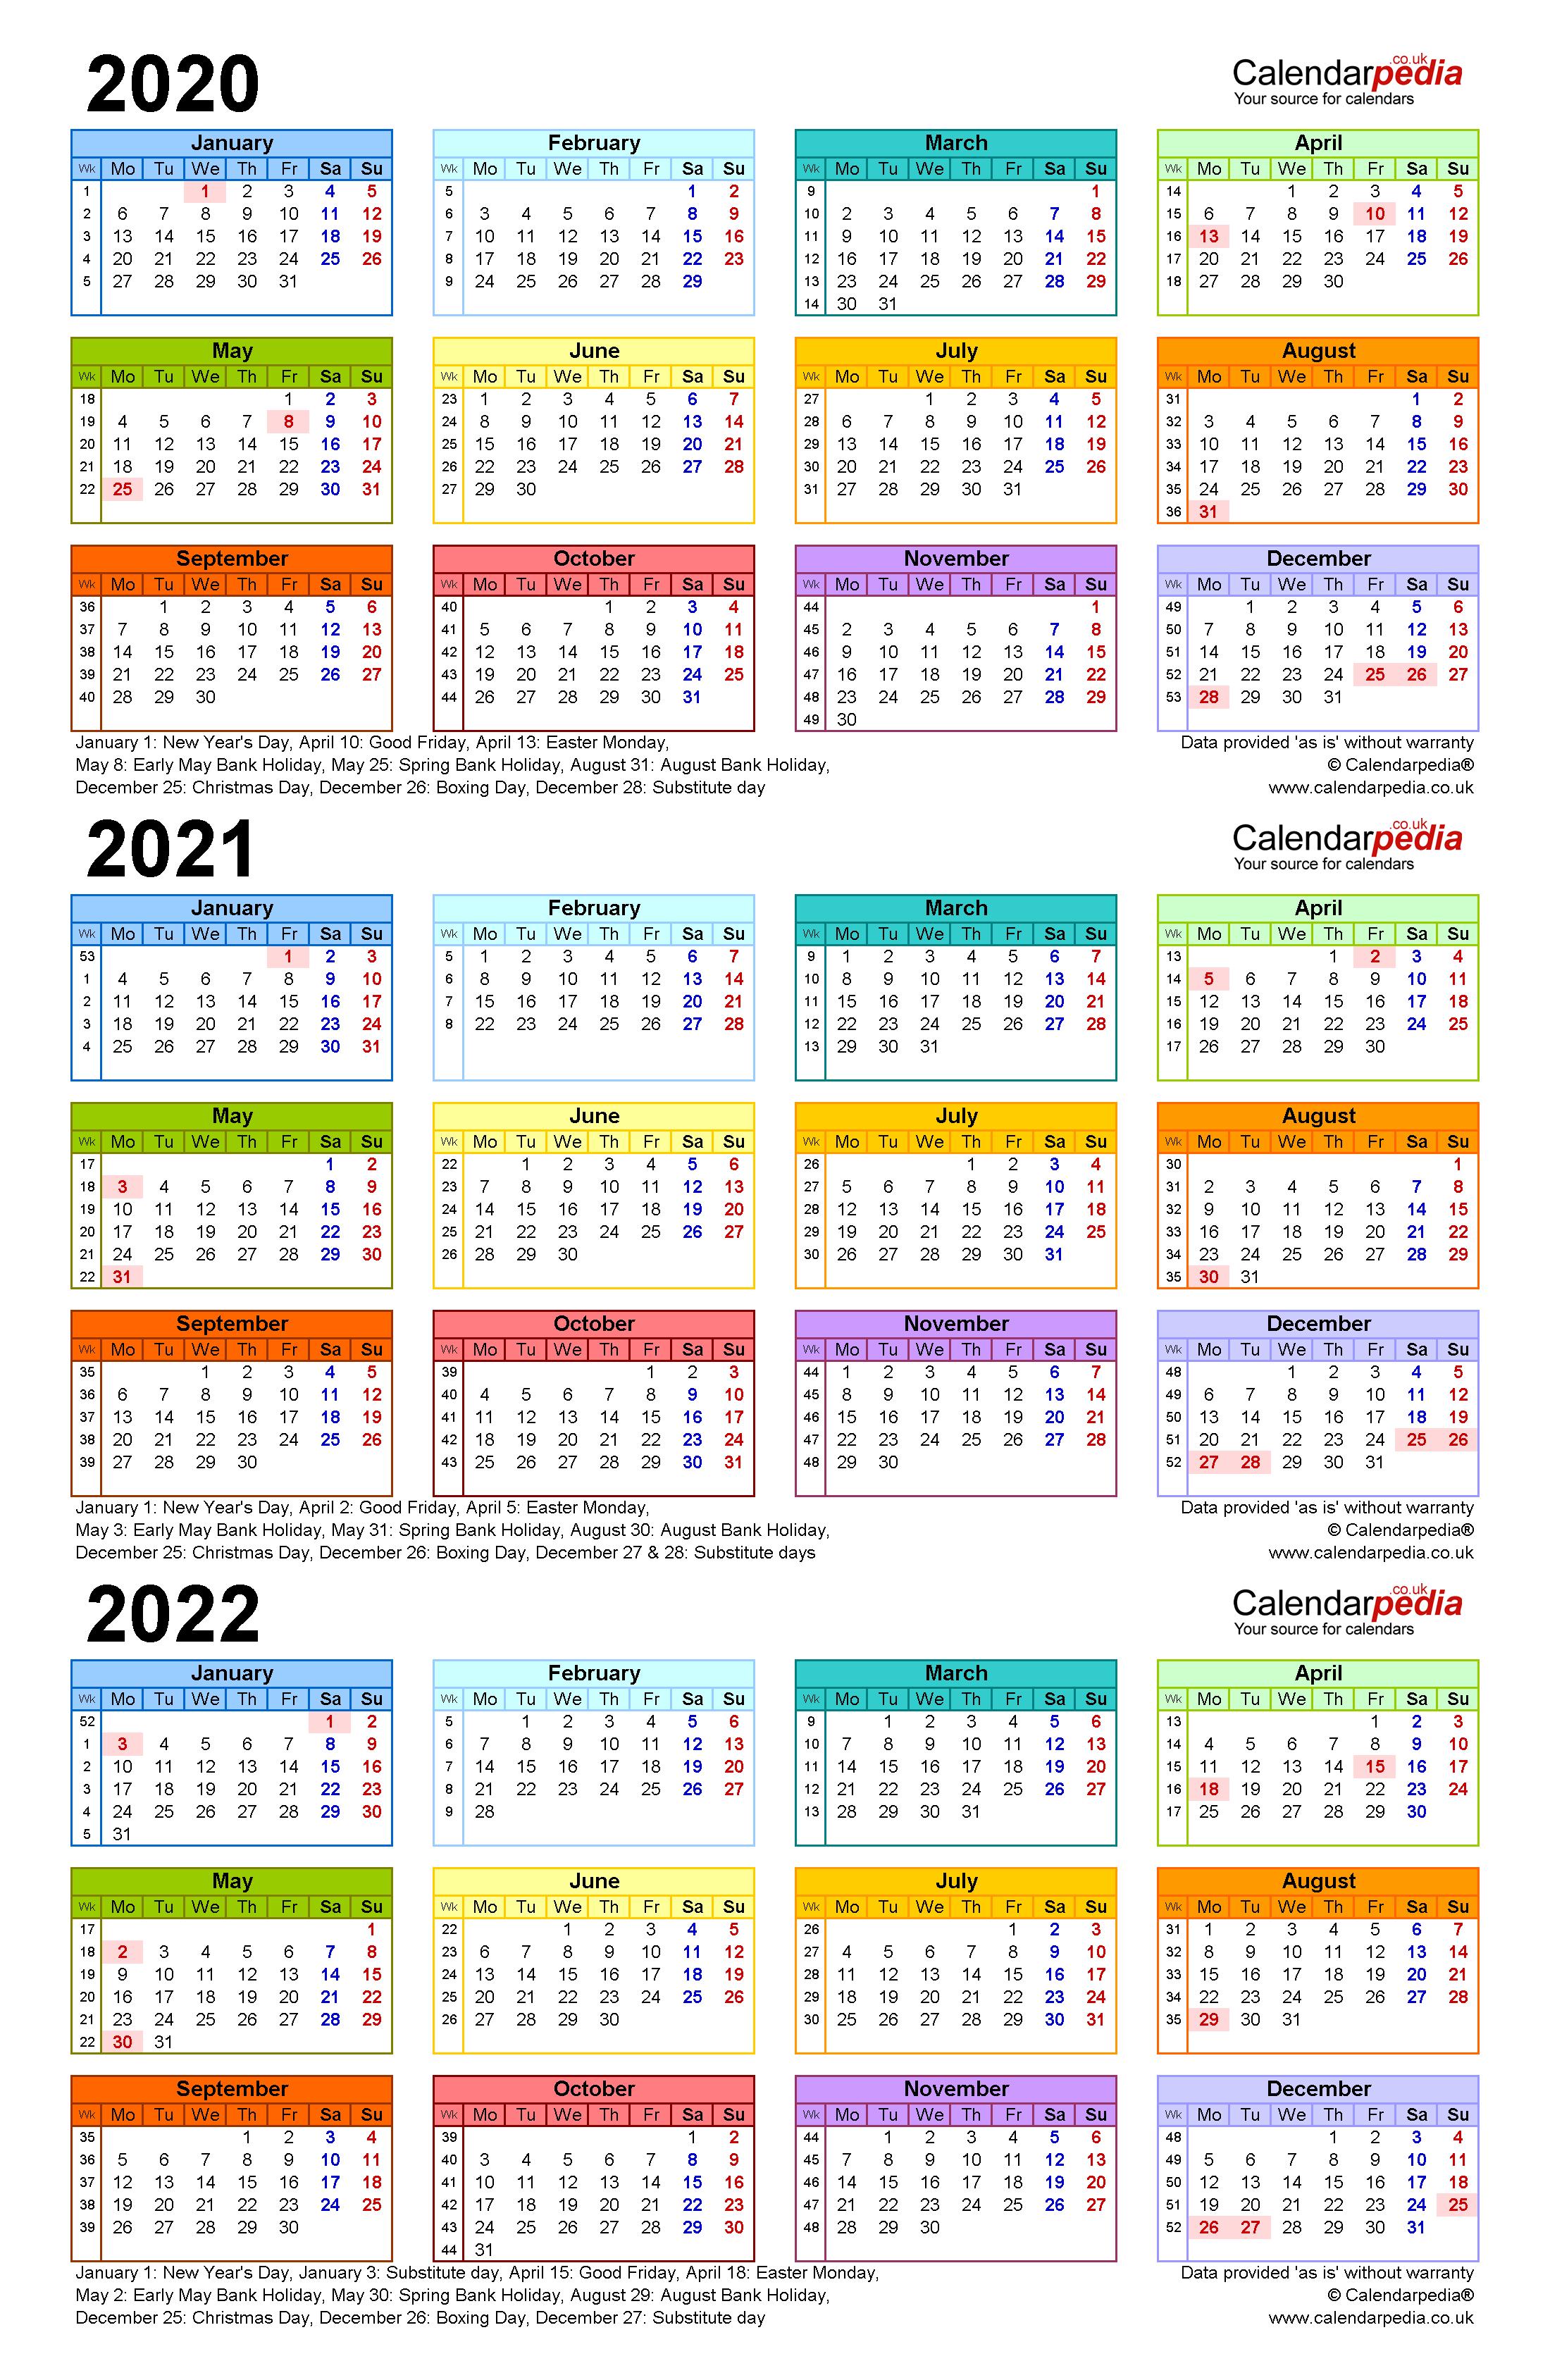 Three Year Calendars For 2020, 2021 & 2022 (Uk) For Pdf regarding 3 Year Calendar 2020 To 2023